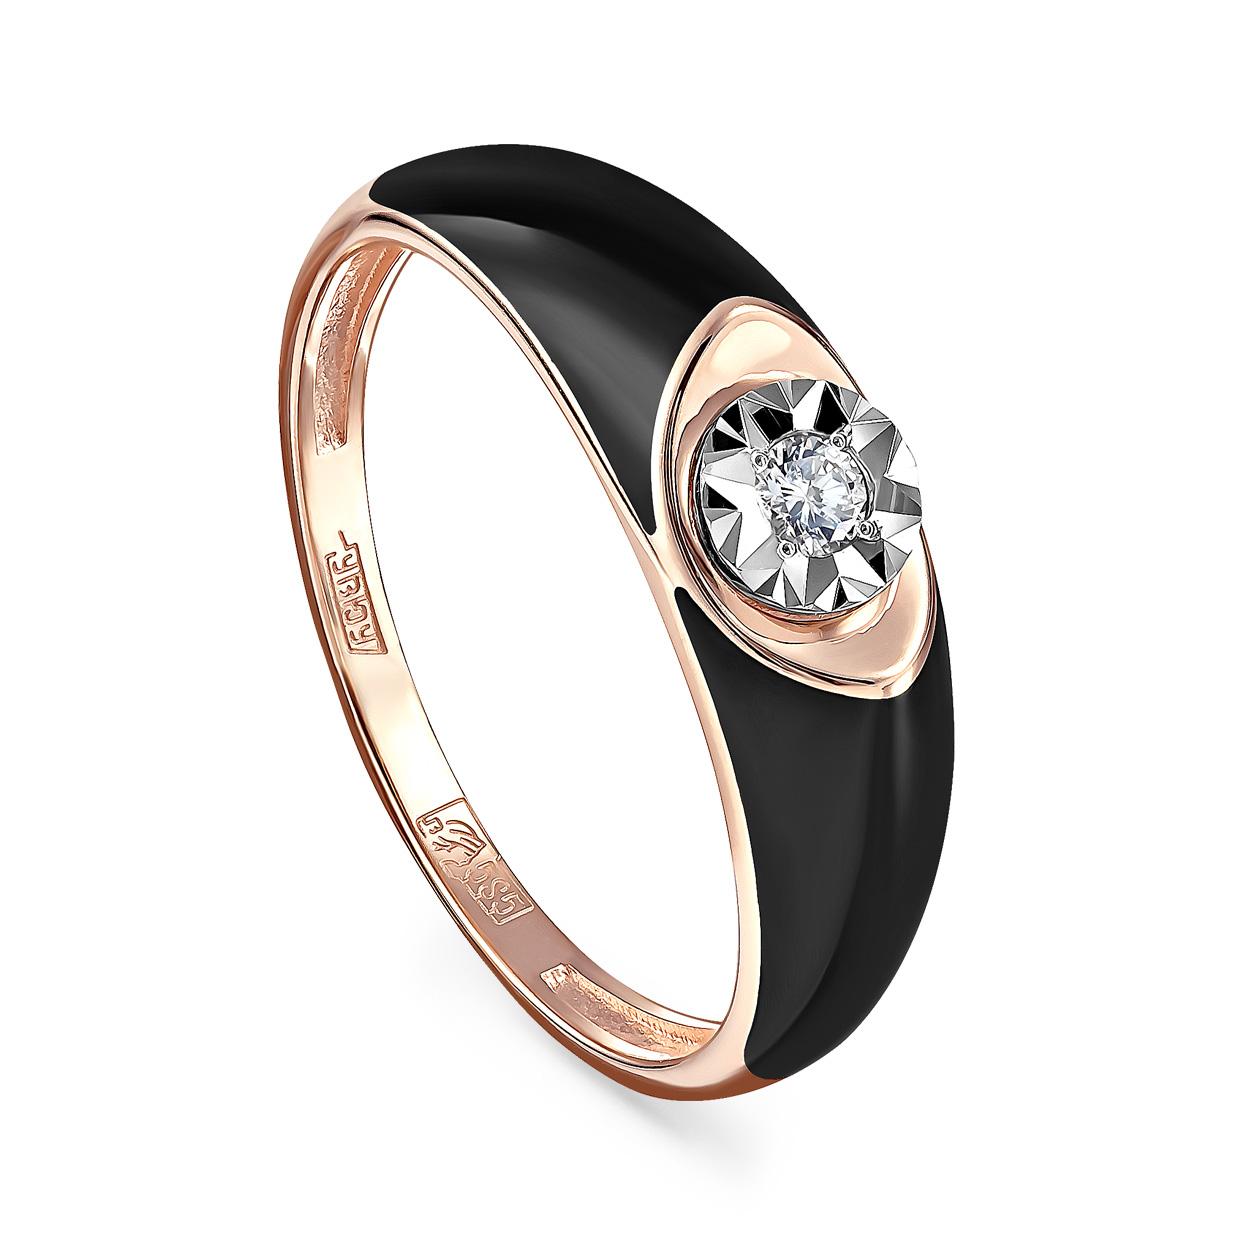 Золотое кольцо Бриллиант арт. 11-0936-1002 11-0936-1002